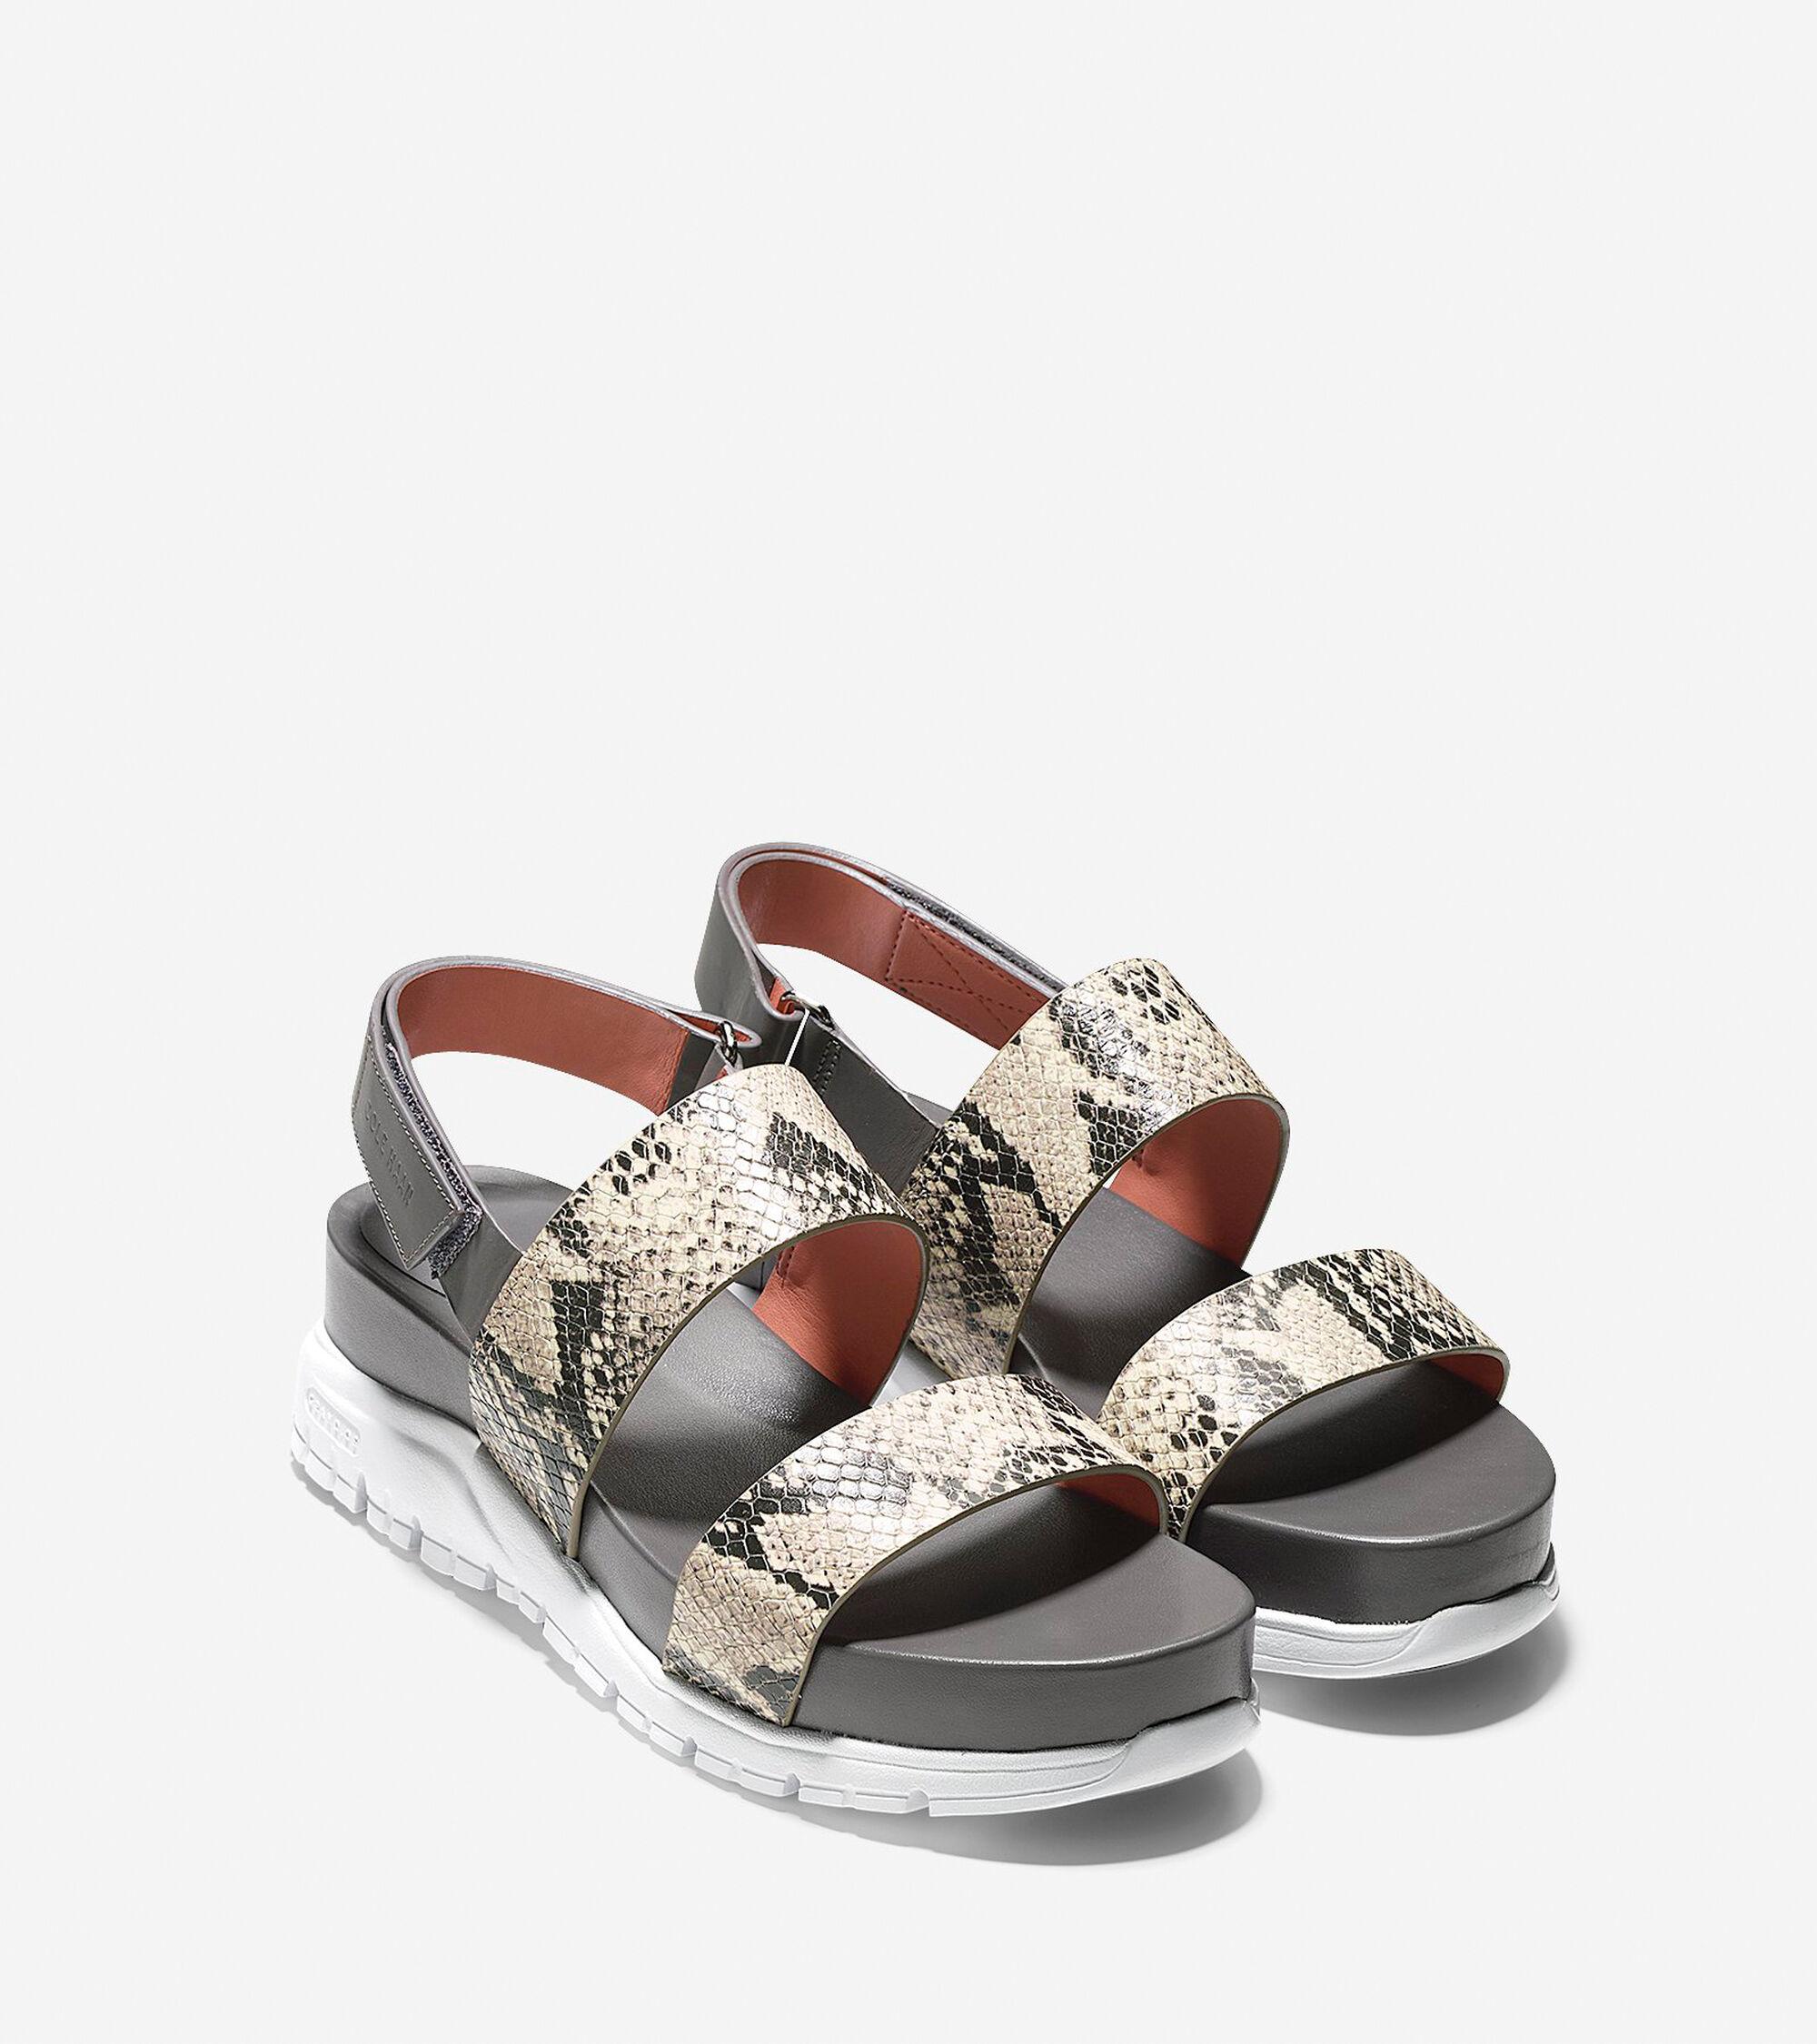 aa848b7d7f02 ZEROGRAND Slide Sandals in Roccia Snake